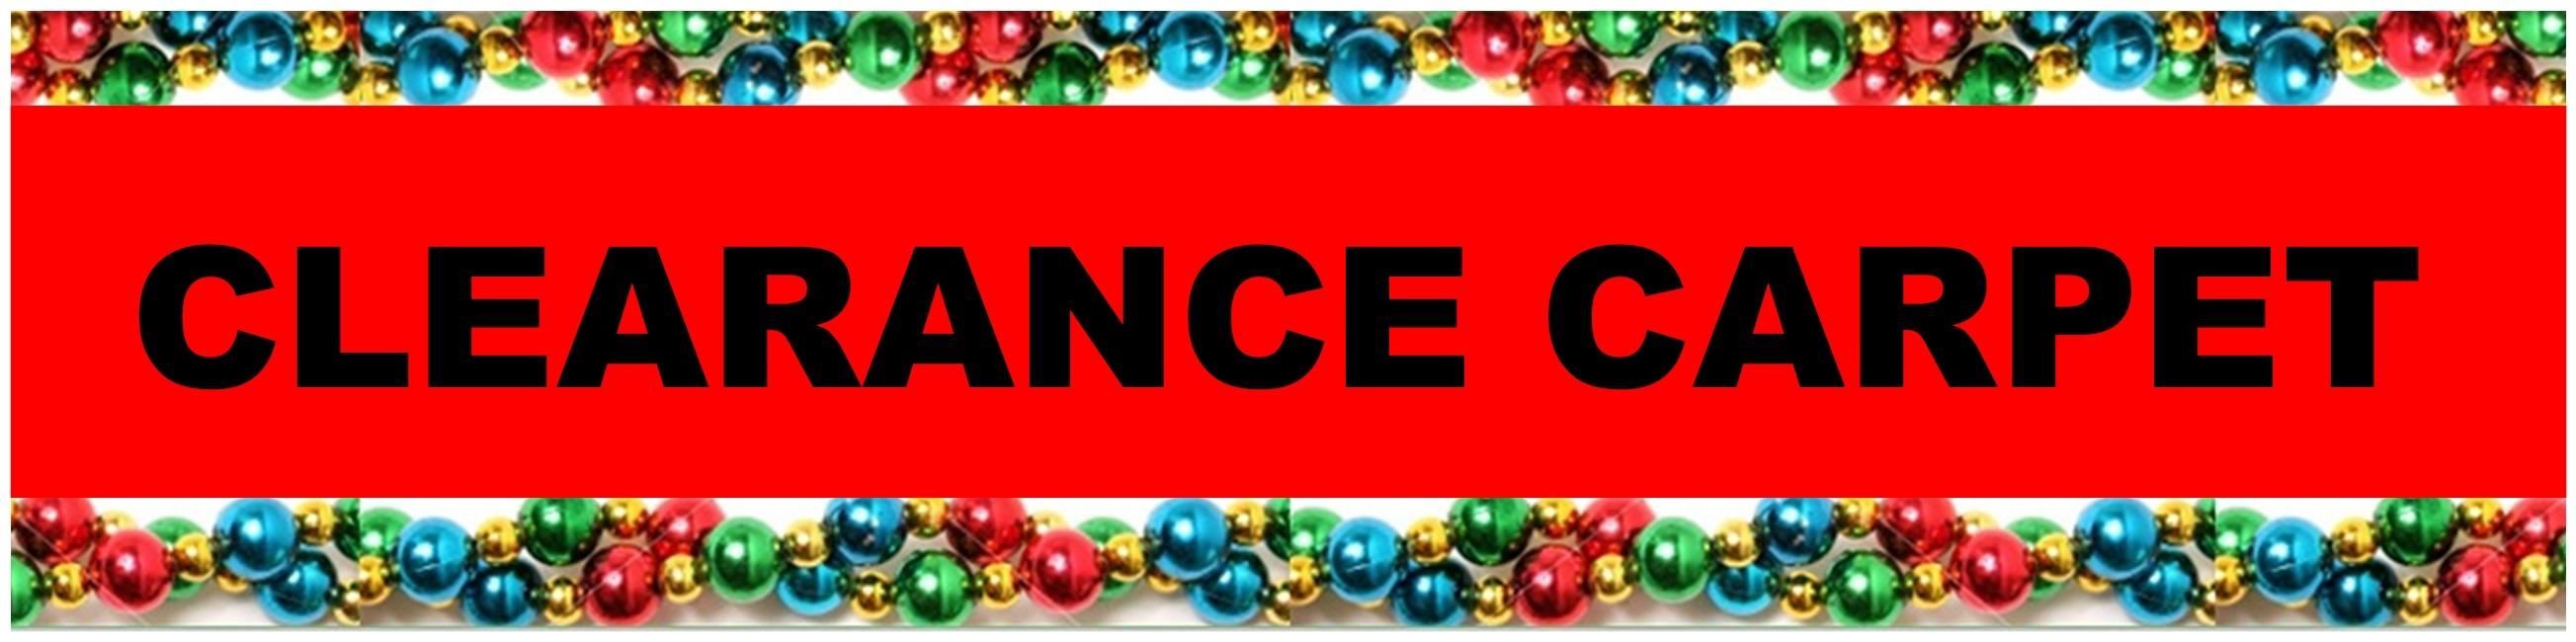 CHRISTMAS CLEARANCE CARPET HEADER